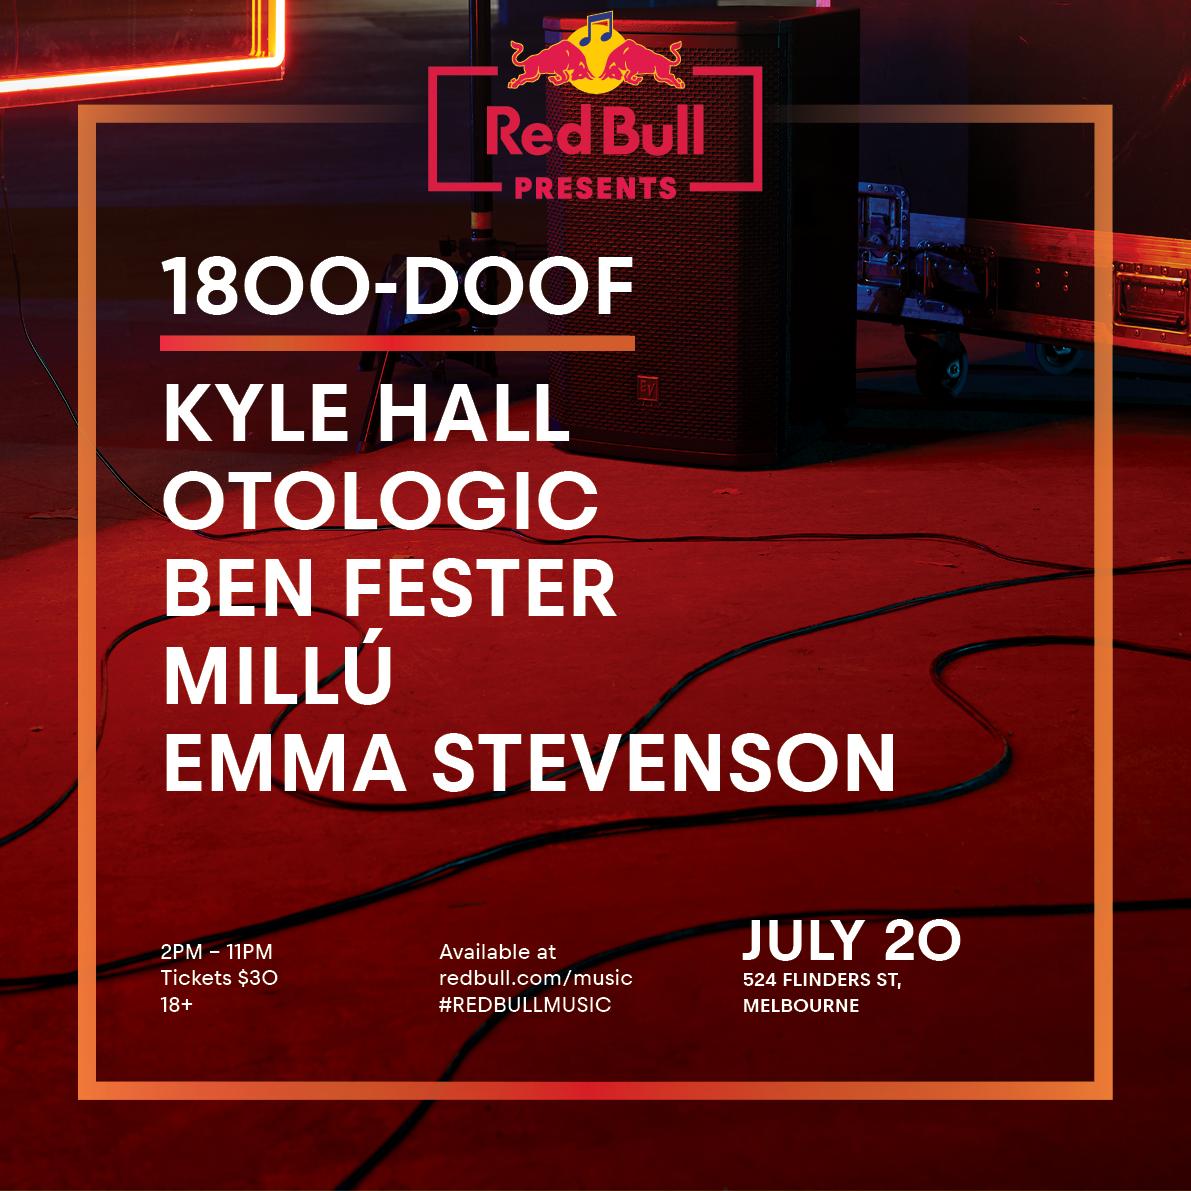 Red Bull presents: 1800-Doof - Sat 20th July, 524 Flinders